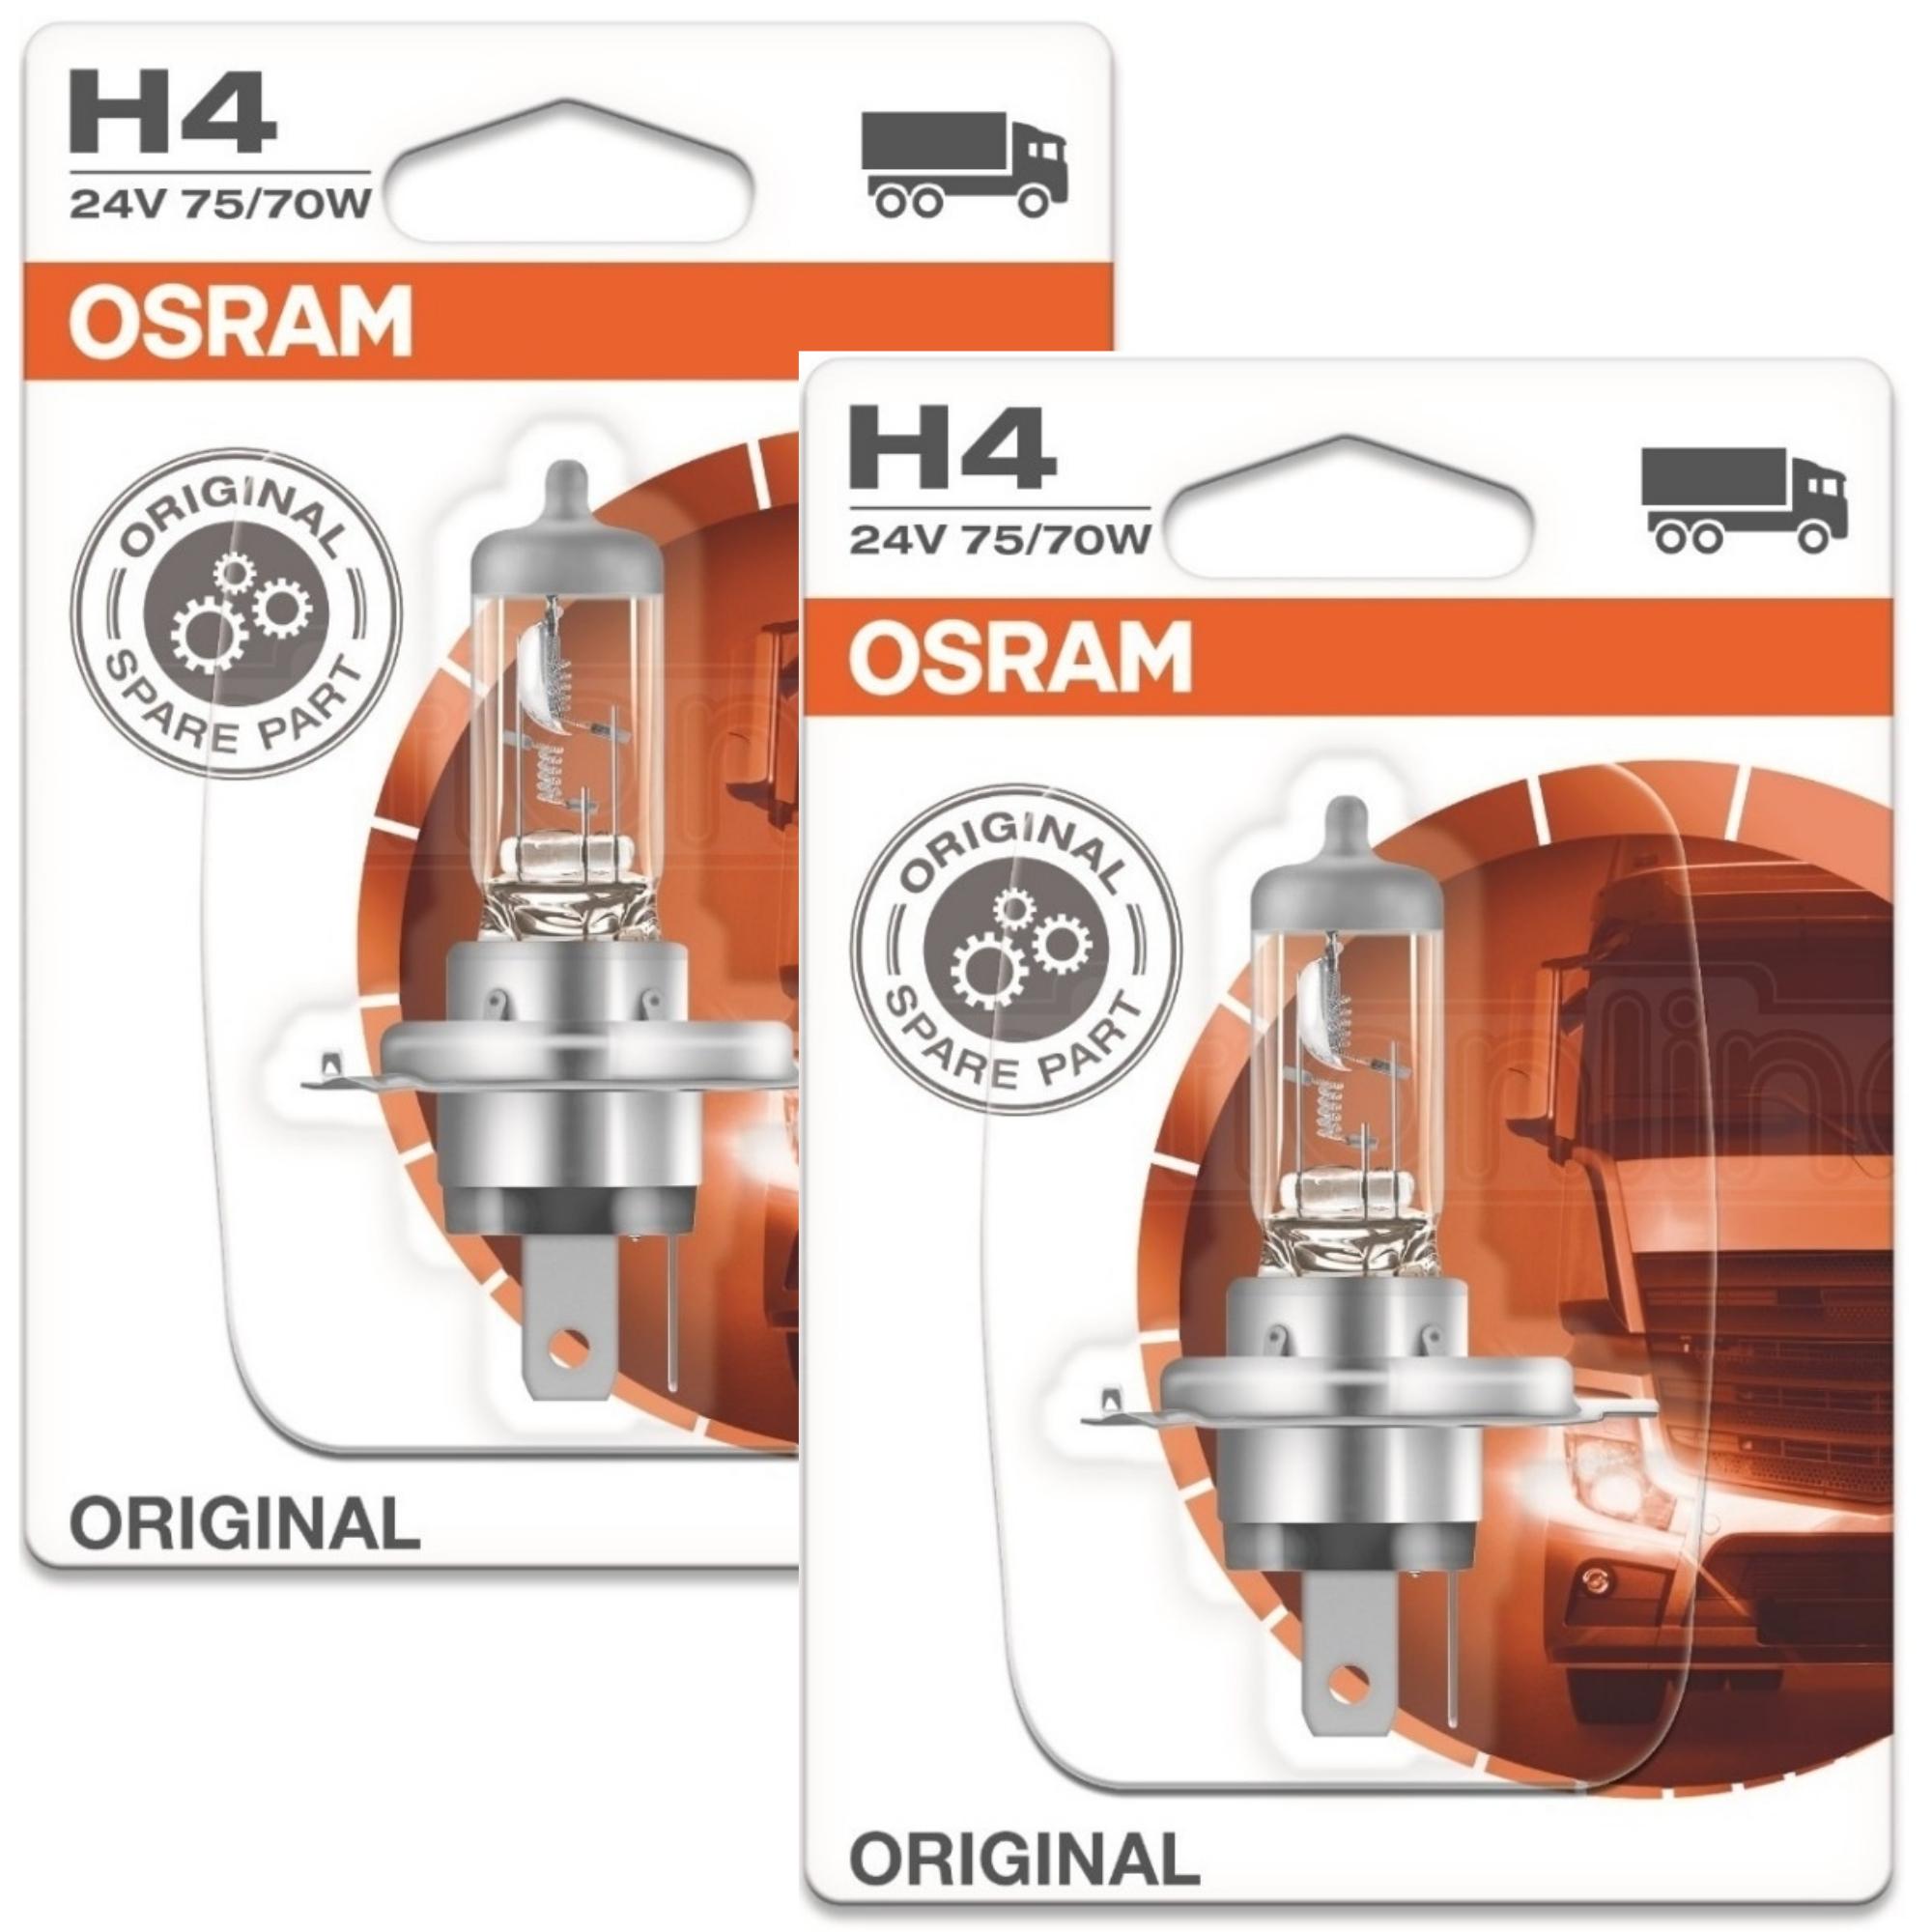 Osram H4 24V 75//70W P43t Halogen Commercial Truck Lorry Dip Headlamp Light Bulb